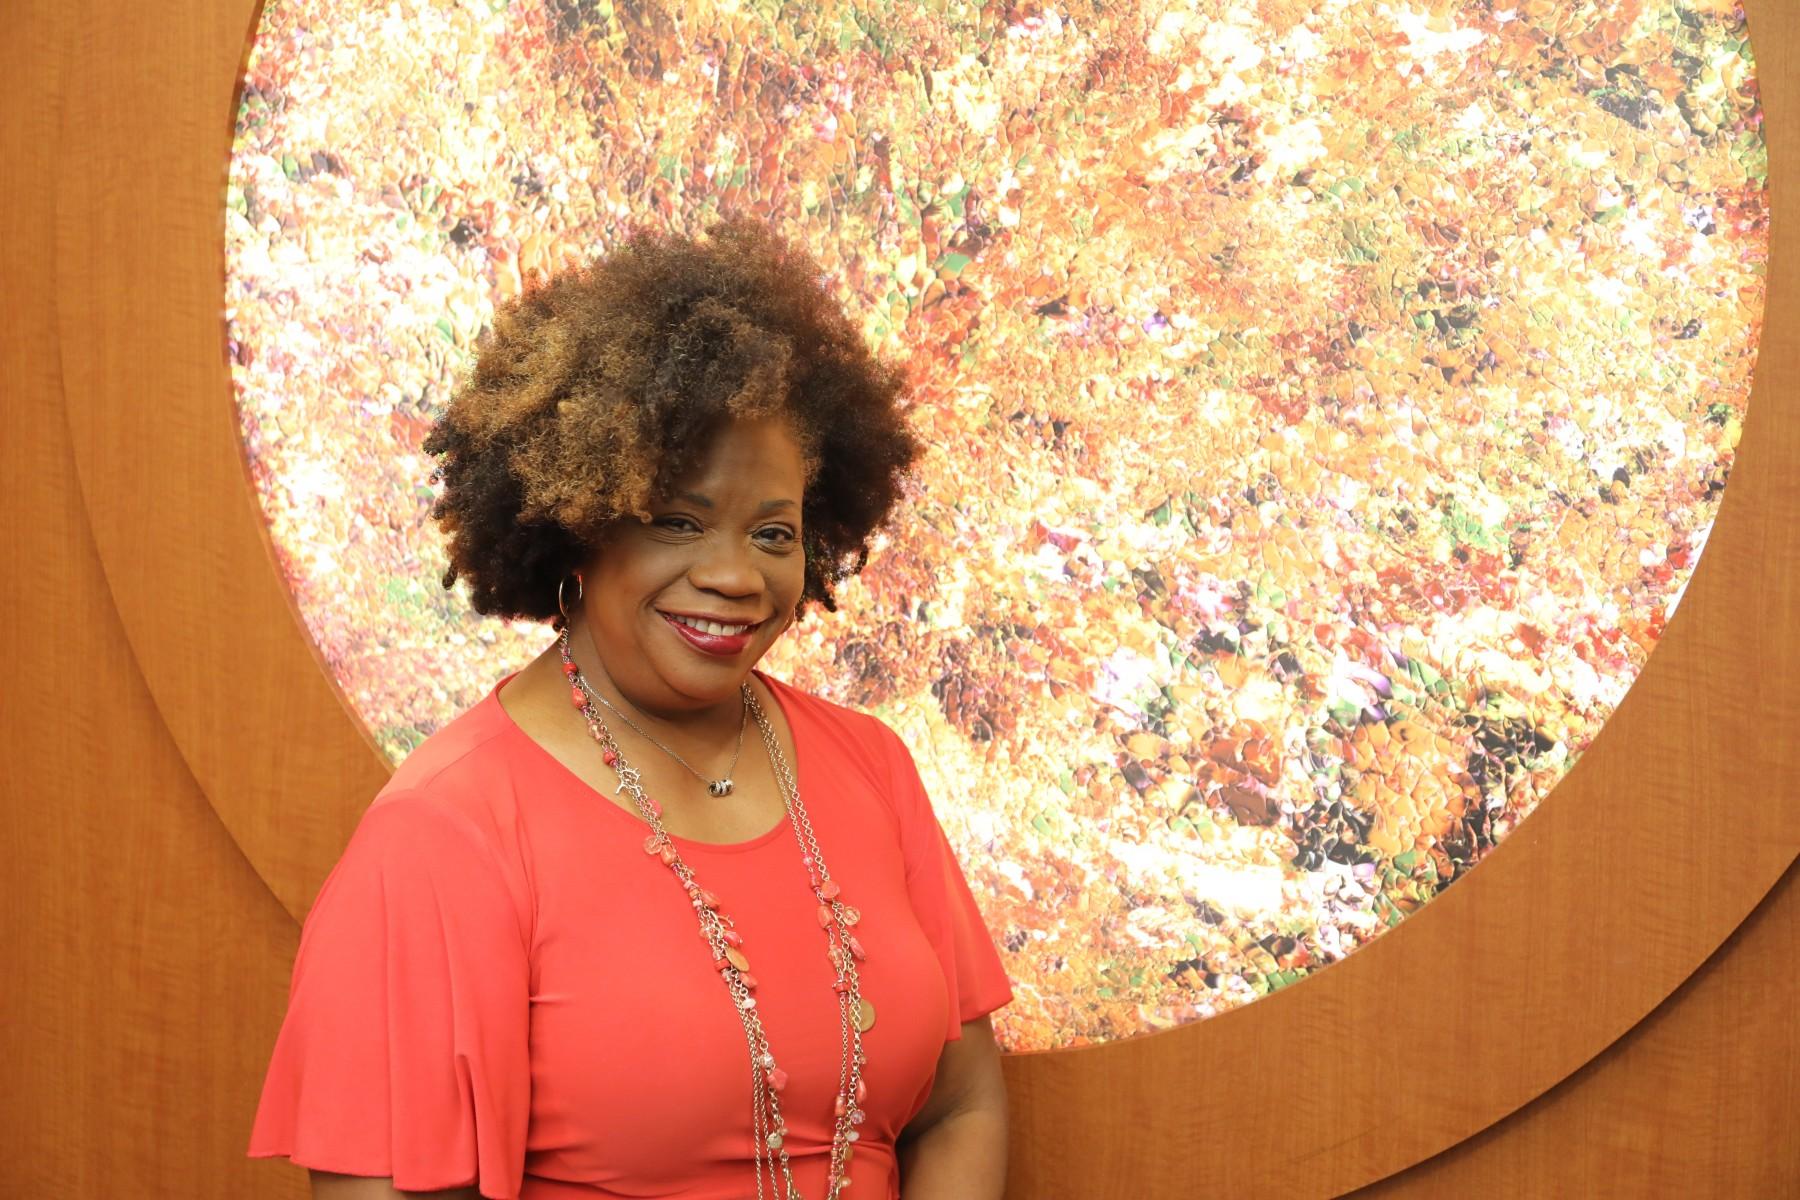 Winifred King,库克儿童医疗保健系统高级副总裁、传播、多样性、公平和包容性主管